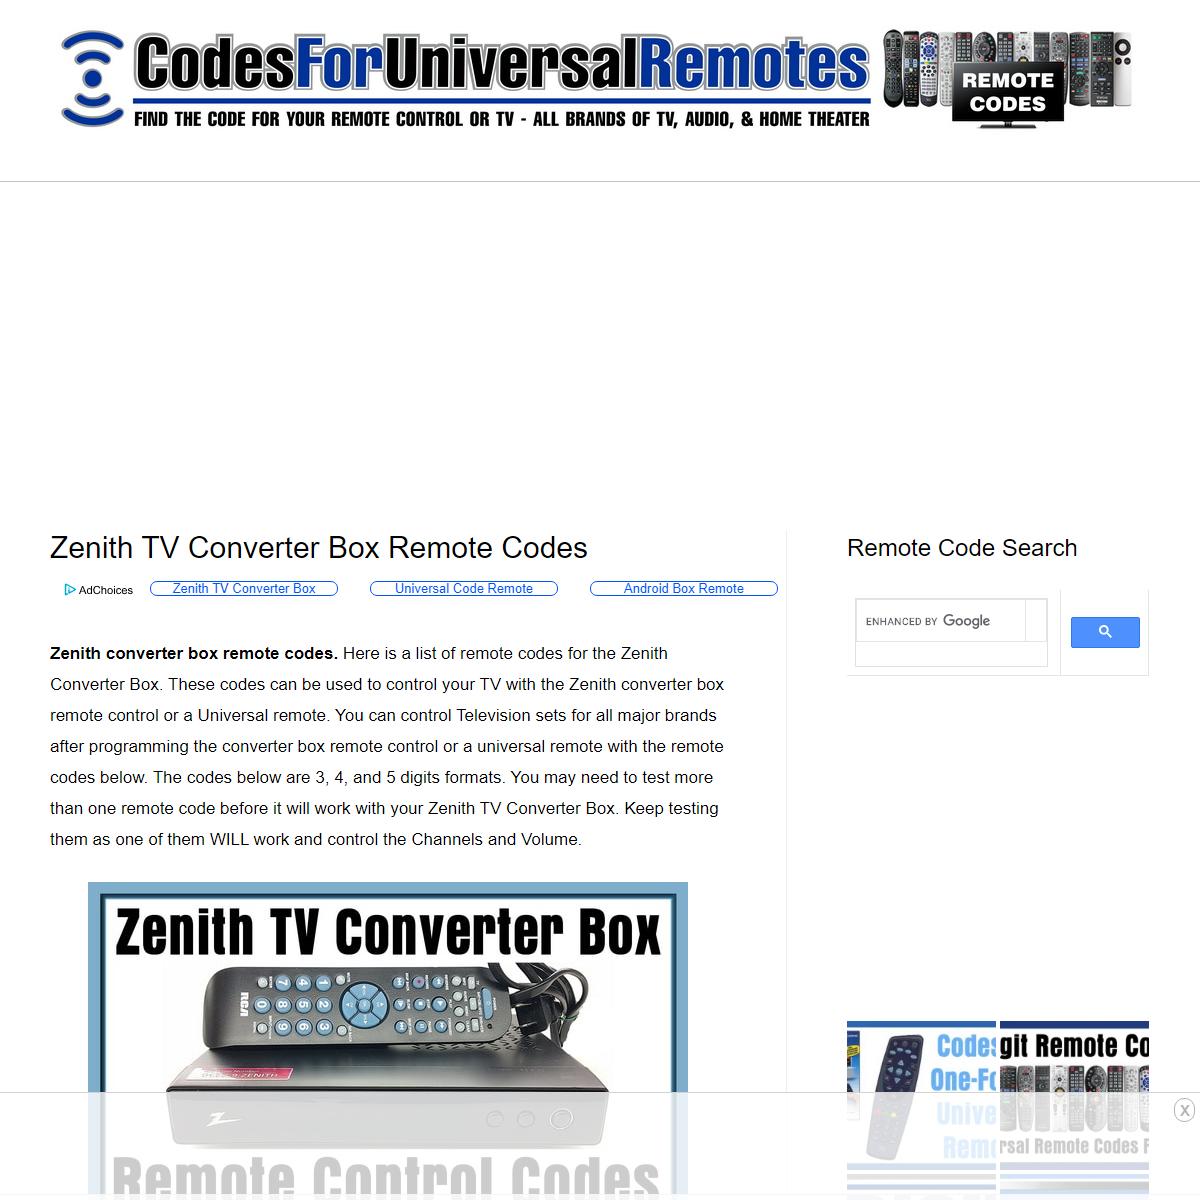 Zenith TV Converter Box Remote Codes - Codes For Universal Remotes